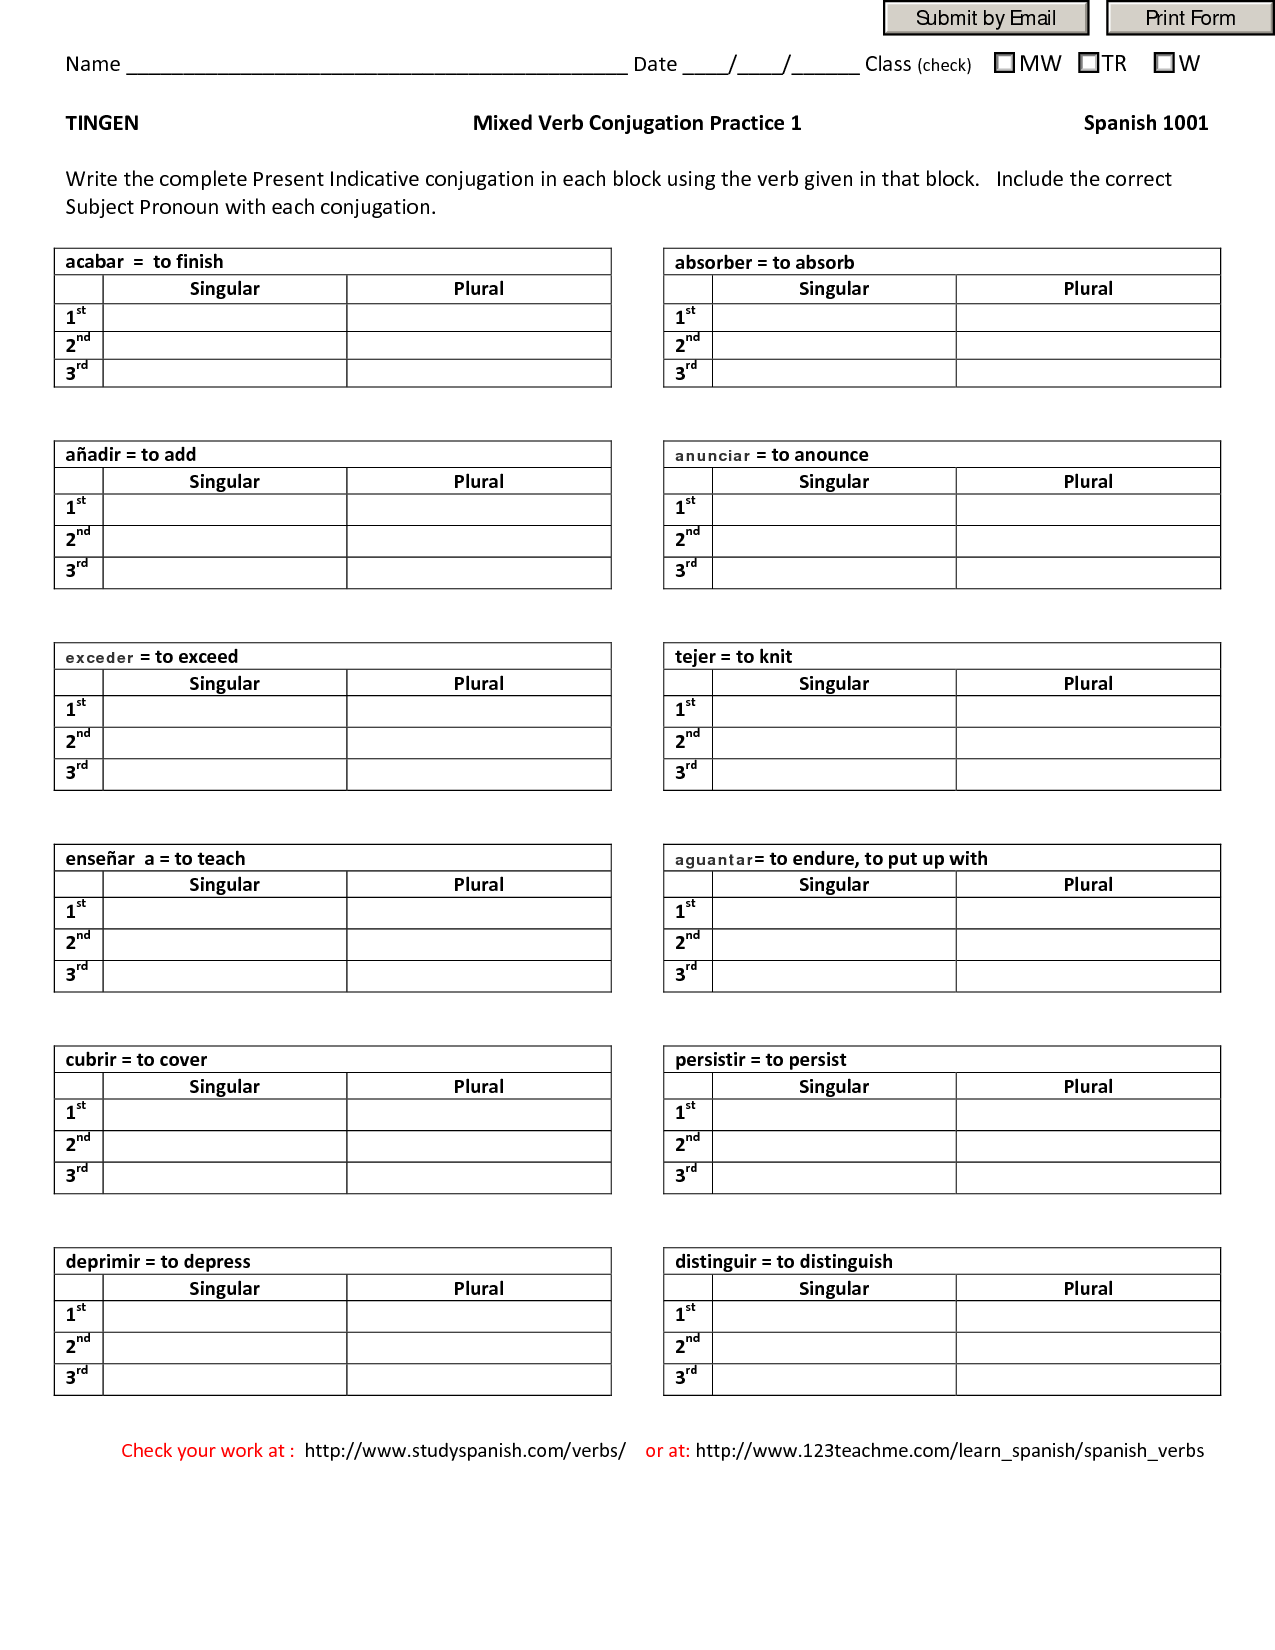 Grammar Worksheet Preterite Tense Irregular Verbs